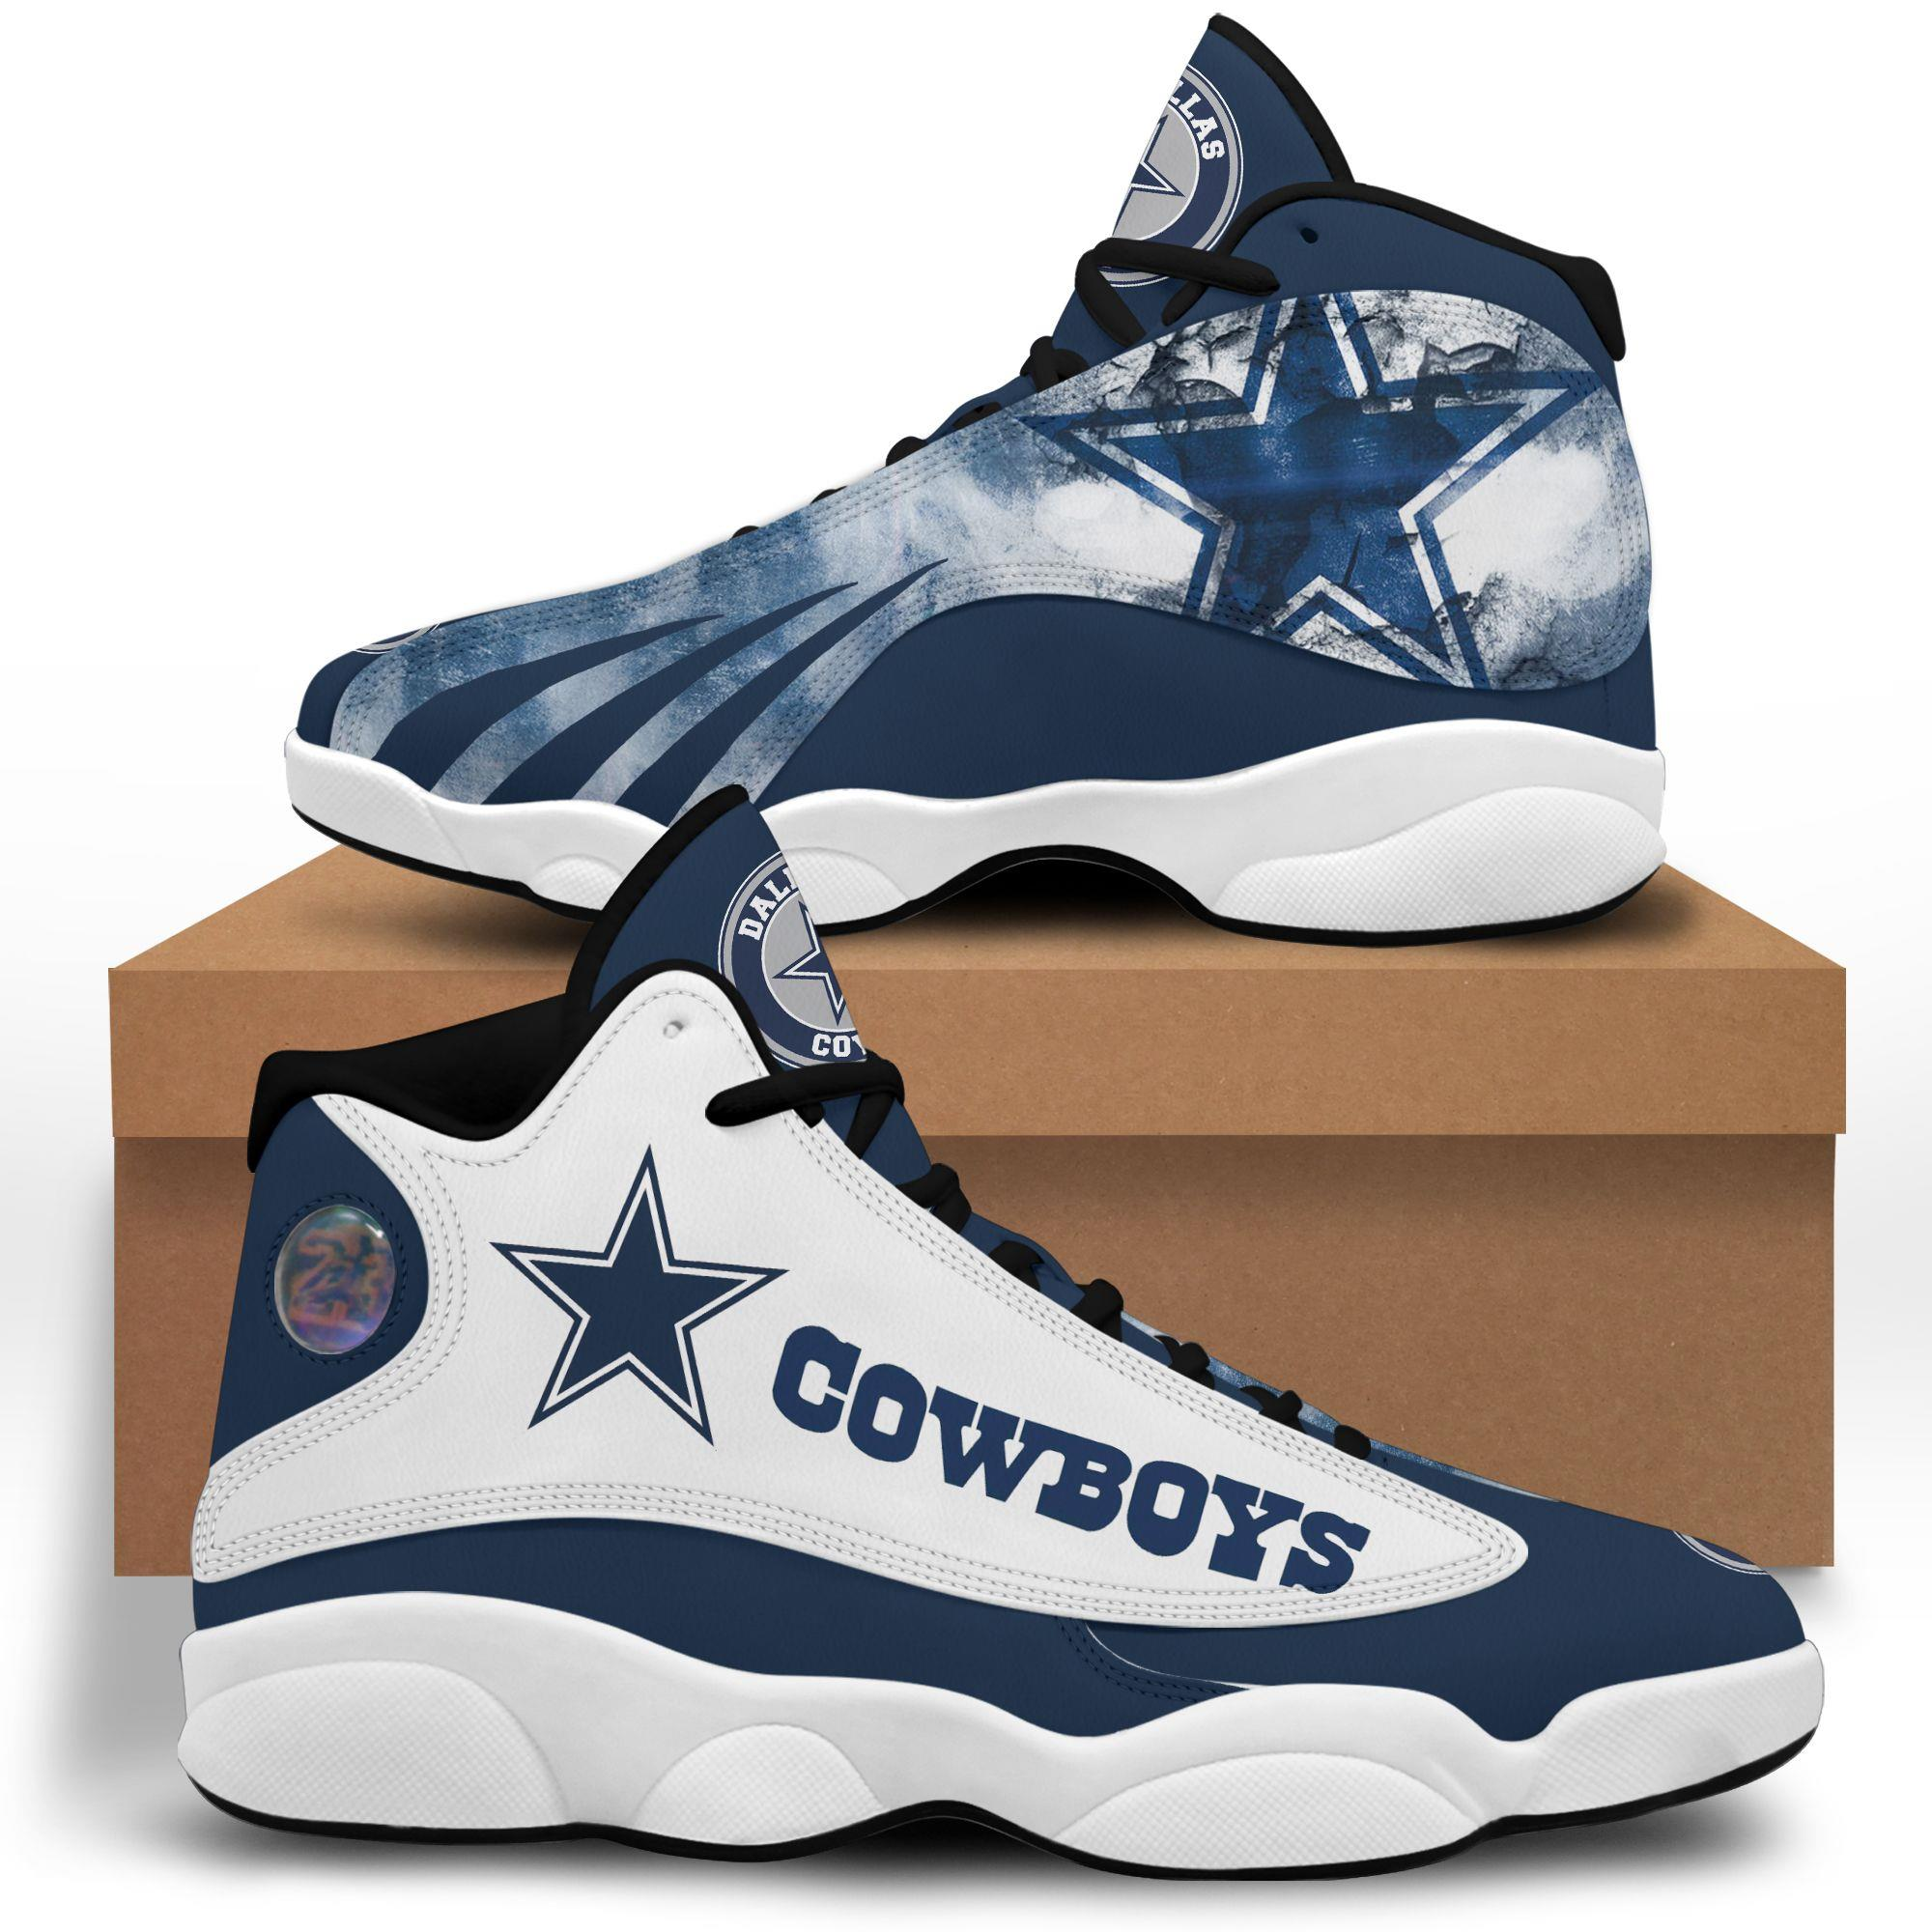 Dallas Cowboys Air Jordan 13 Custom Sneakers Running Shoes